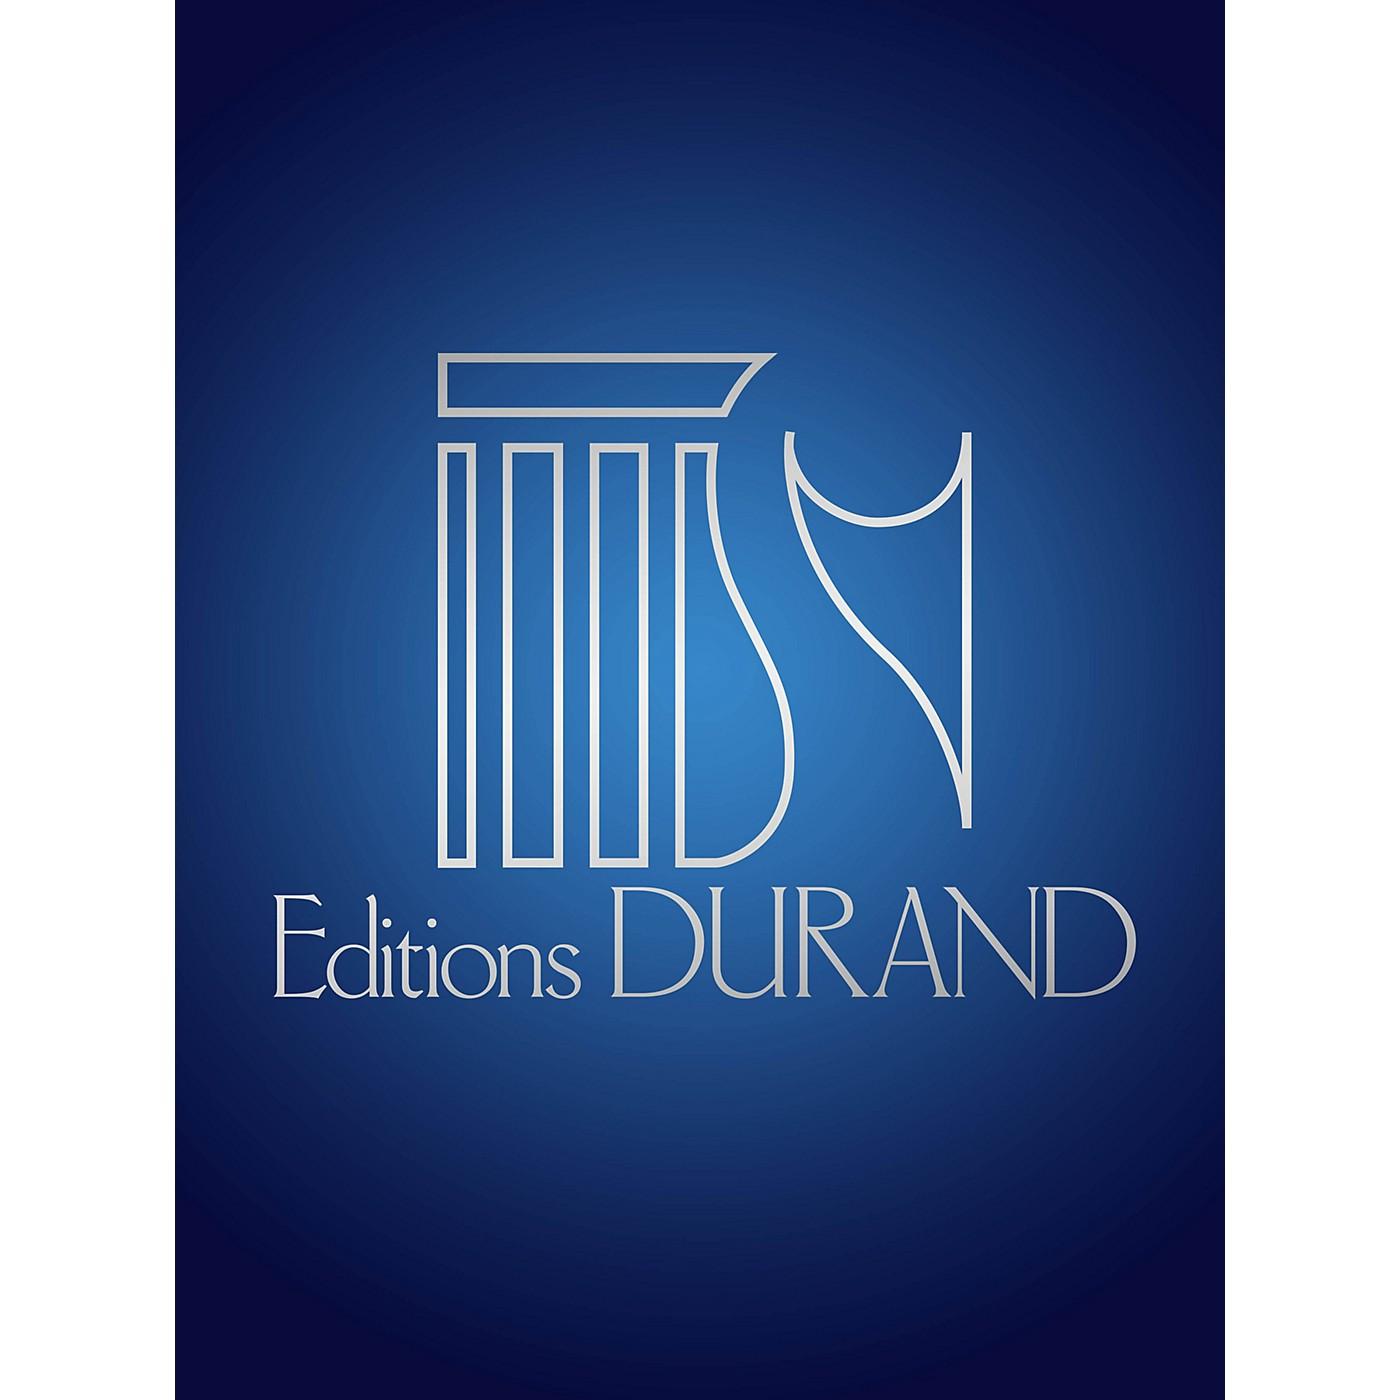 Hal Leonard Livre Pour Six Cordes (book For 6-string Guitar) Editions Durand Series thumbnail